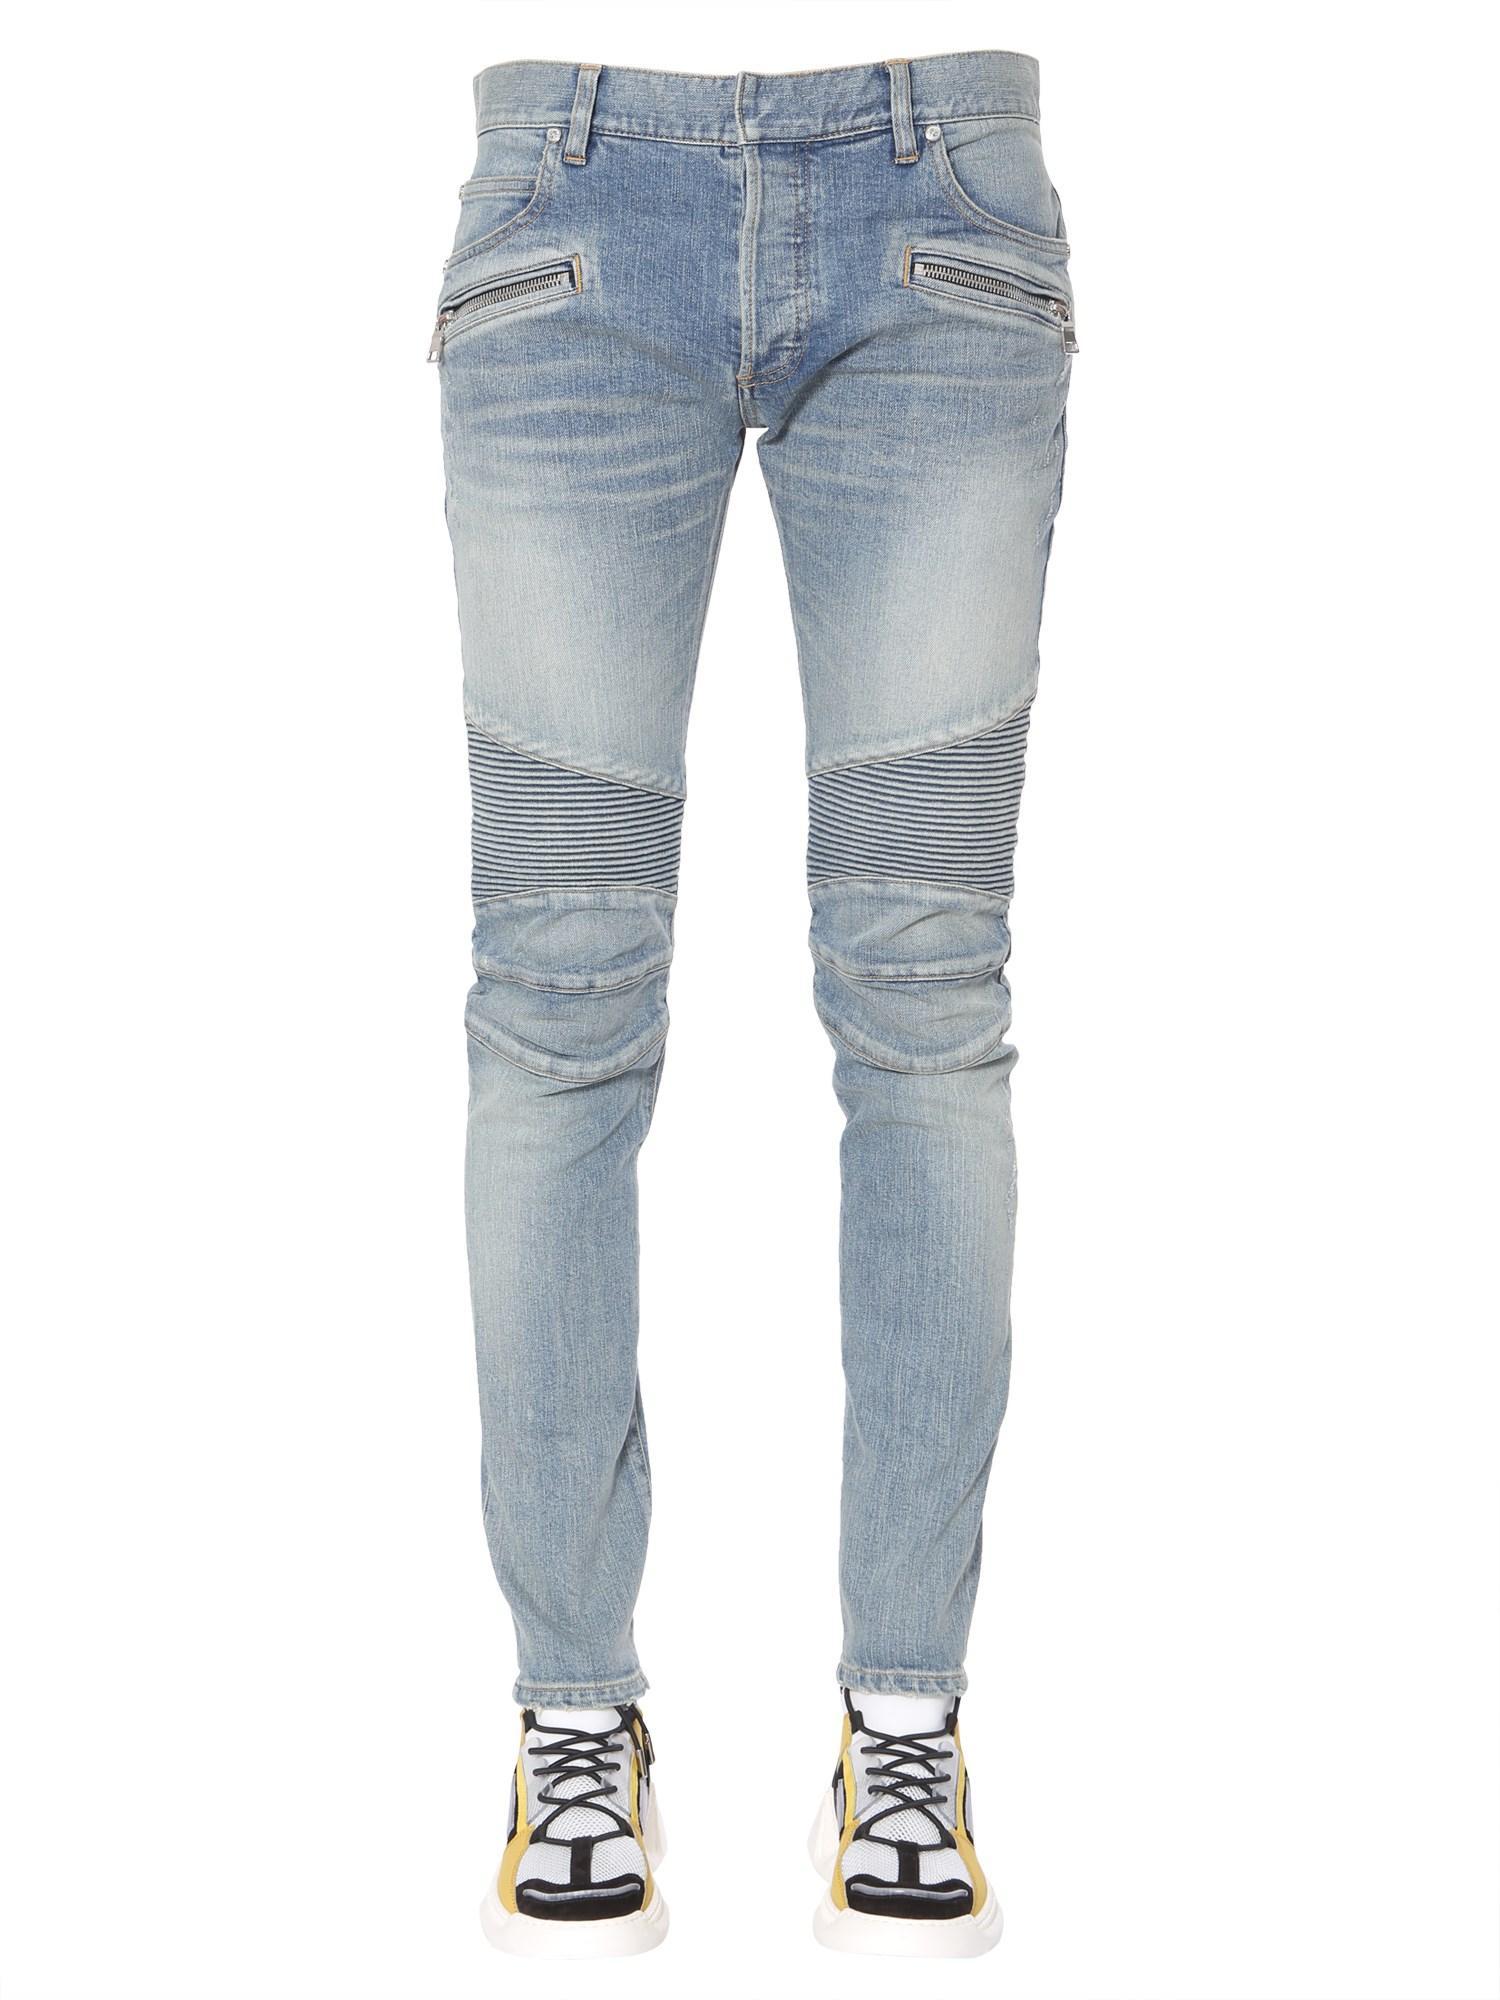 0c5559e0 Lyst - Balmain Jeans Biker Slim Fit in Blue for Men